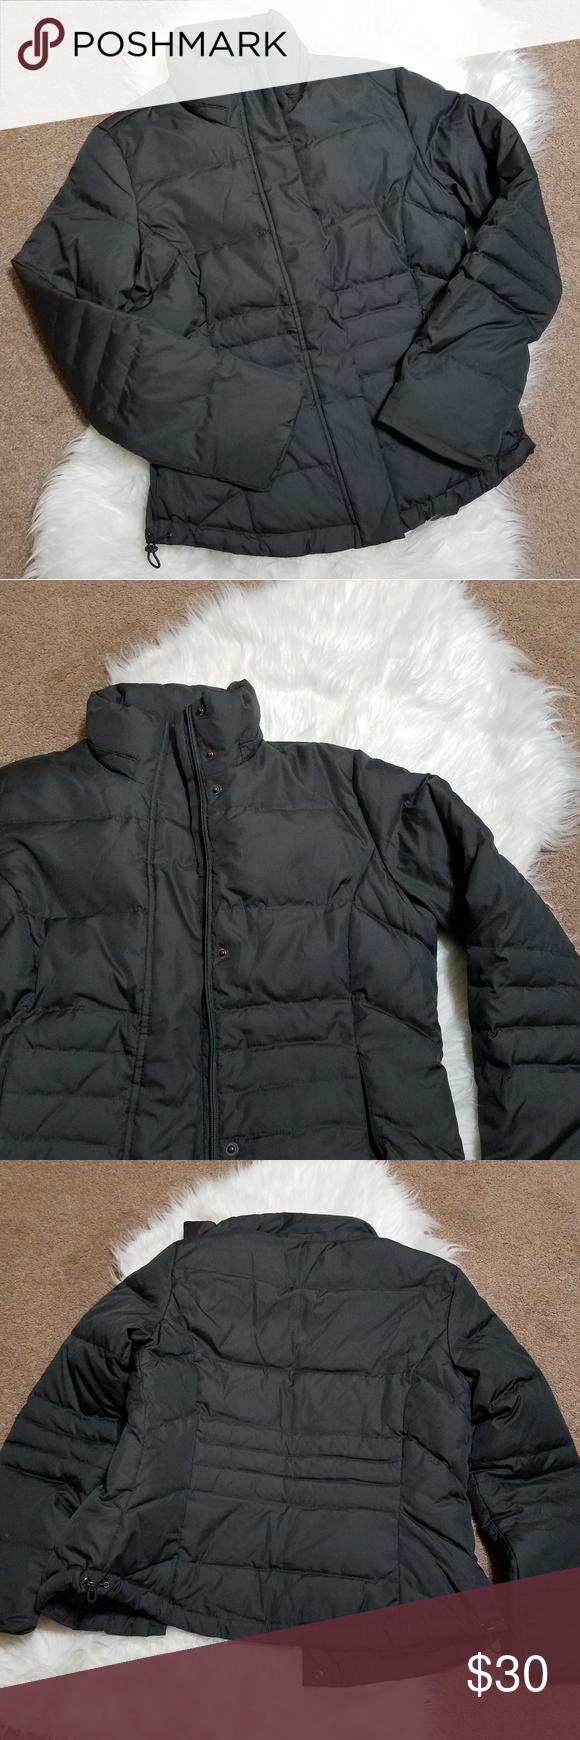 Calvin Klein Performance Puffer Jacket Size Small Clothes Design Calvin Klein Grey Calvin Klein [ 1740 x 580 Pixel ]